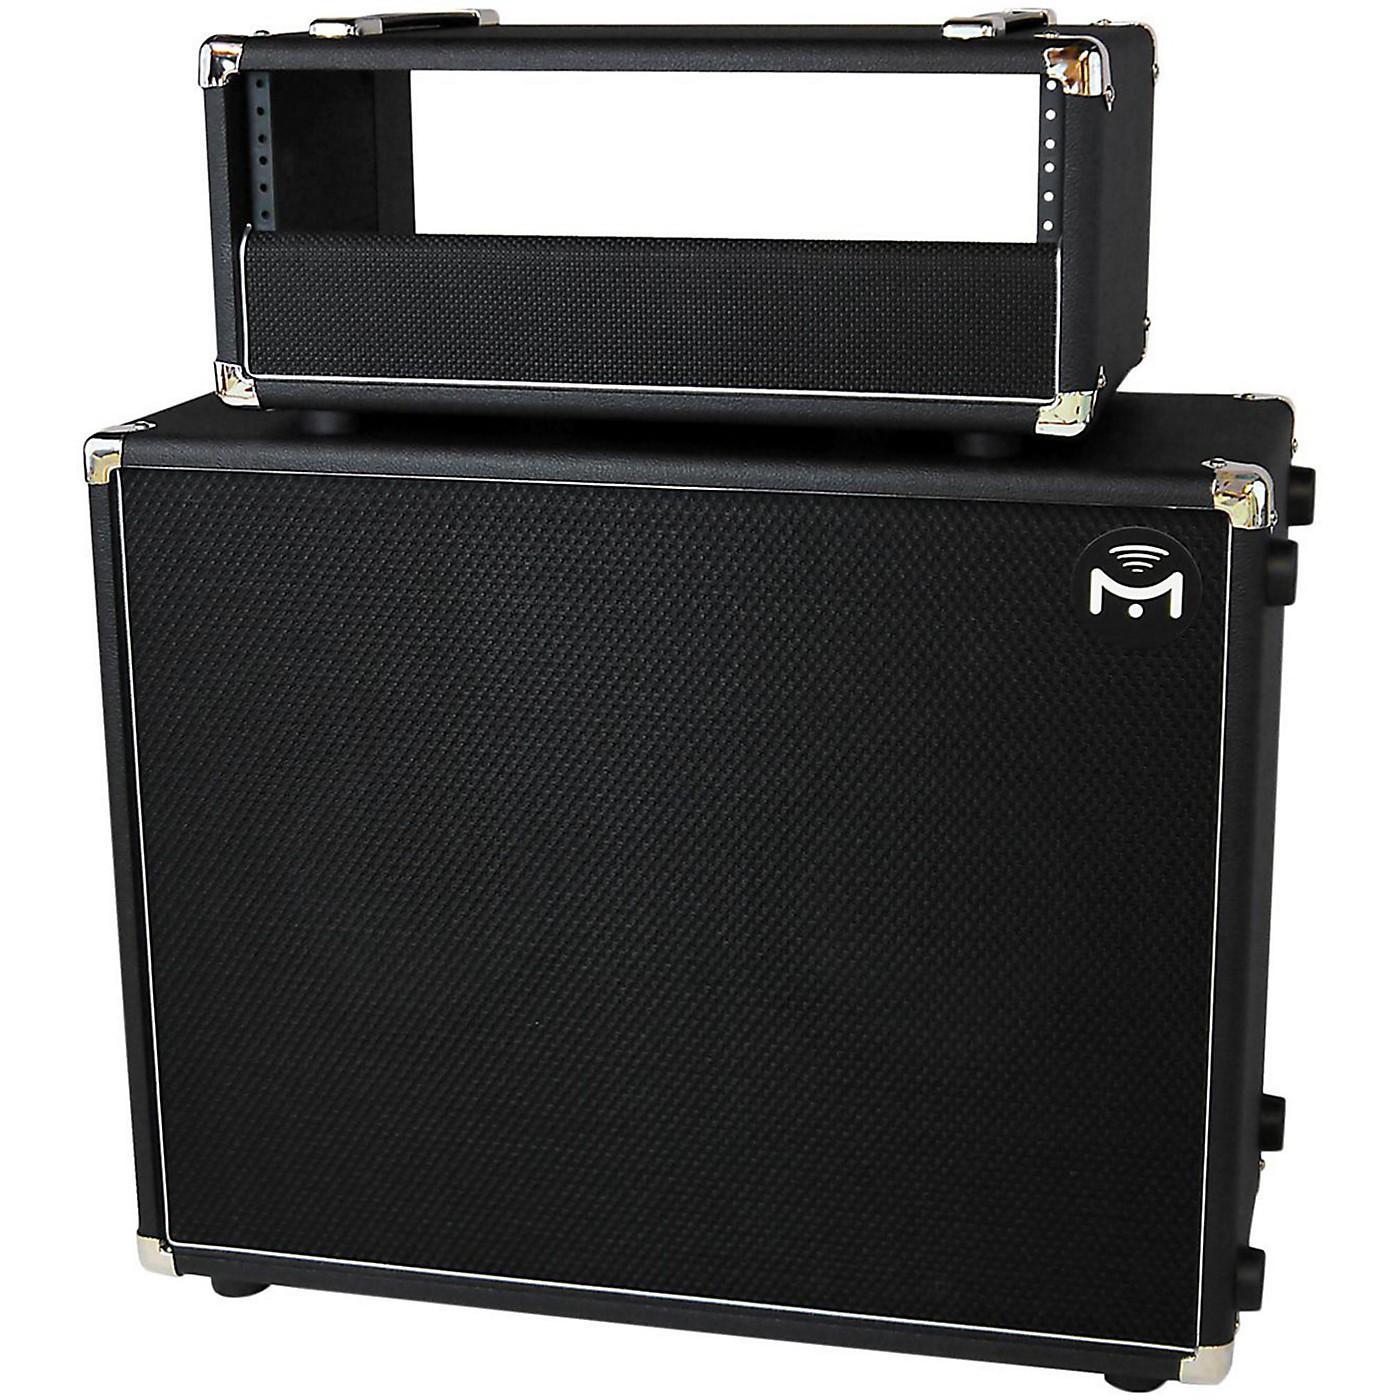 Mission Engineering Gemini GM-HS Guitar Head Unit with GM2 2x12 220W Cab thumbnail